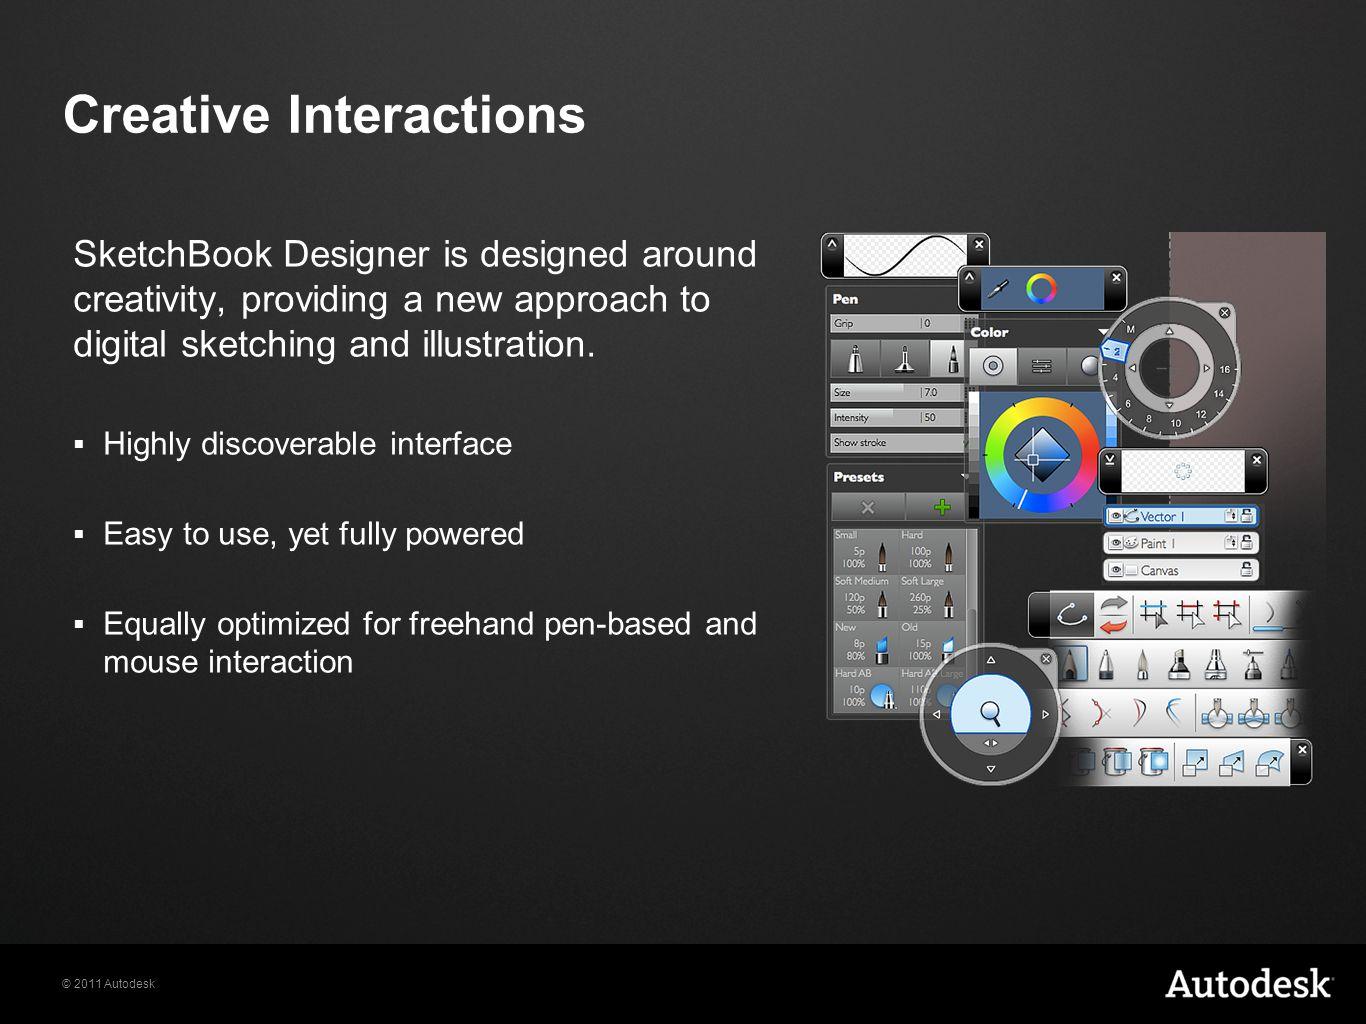 Creative Interactions